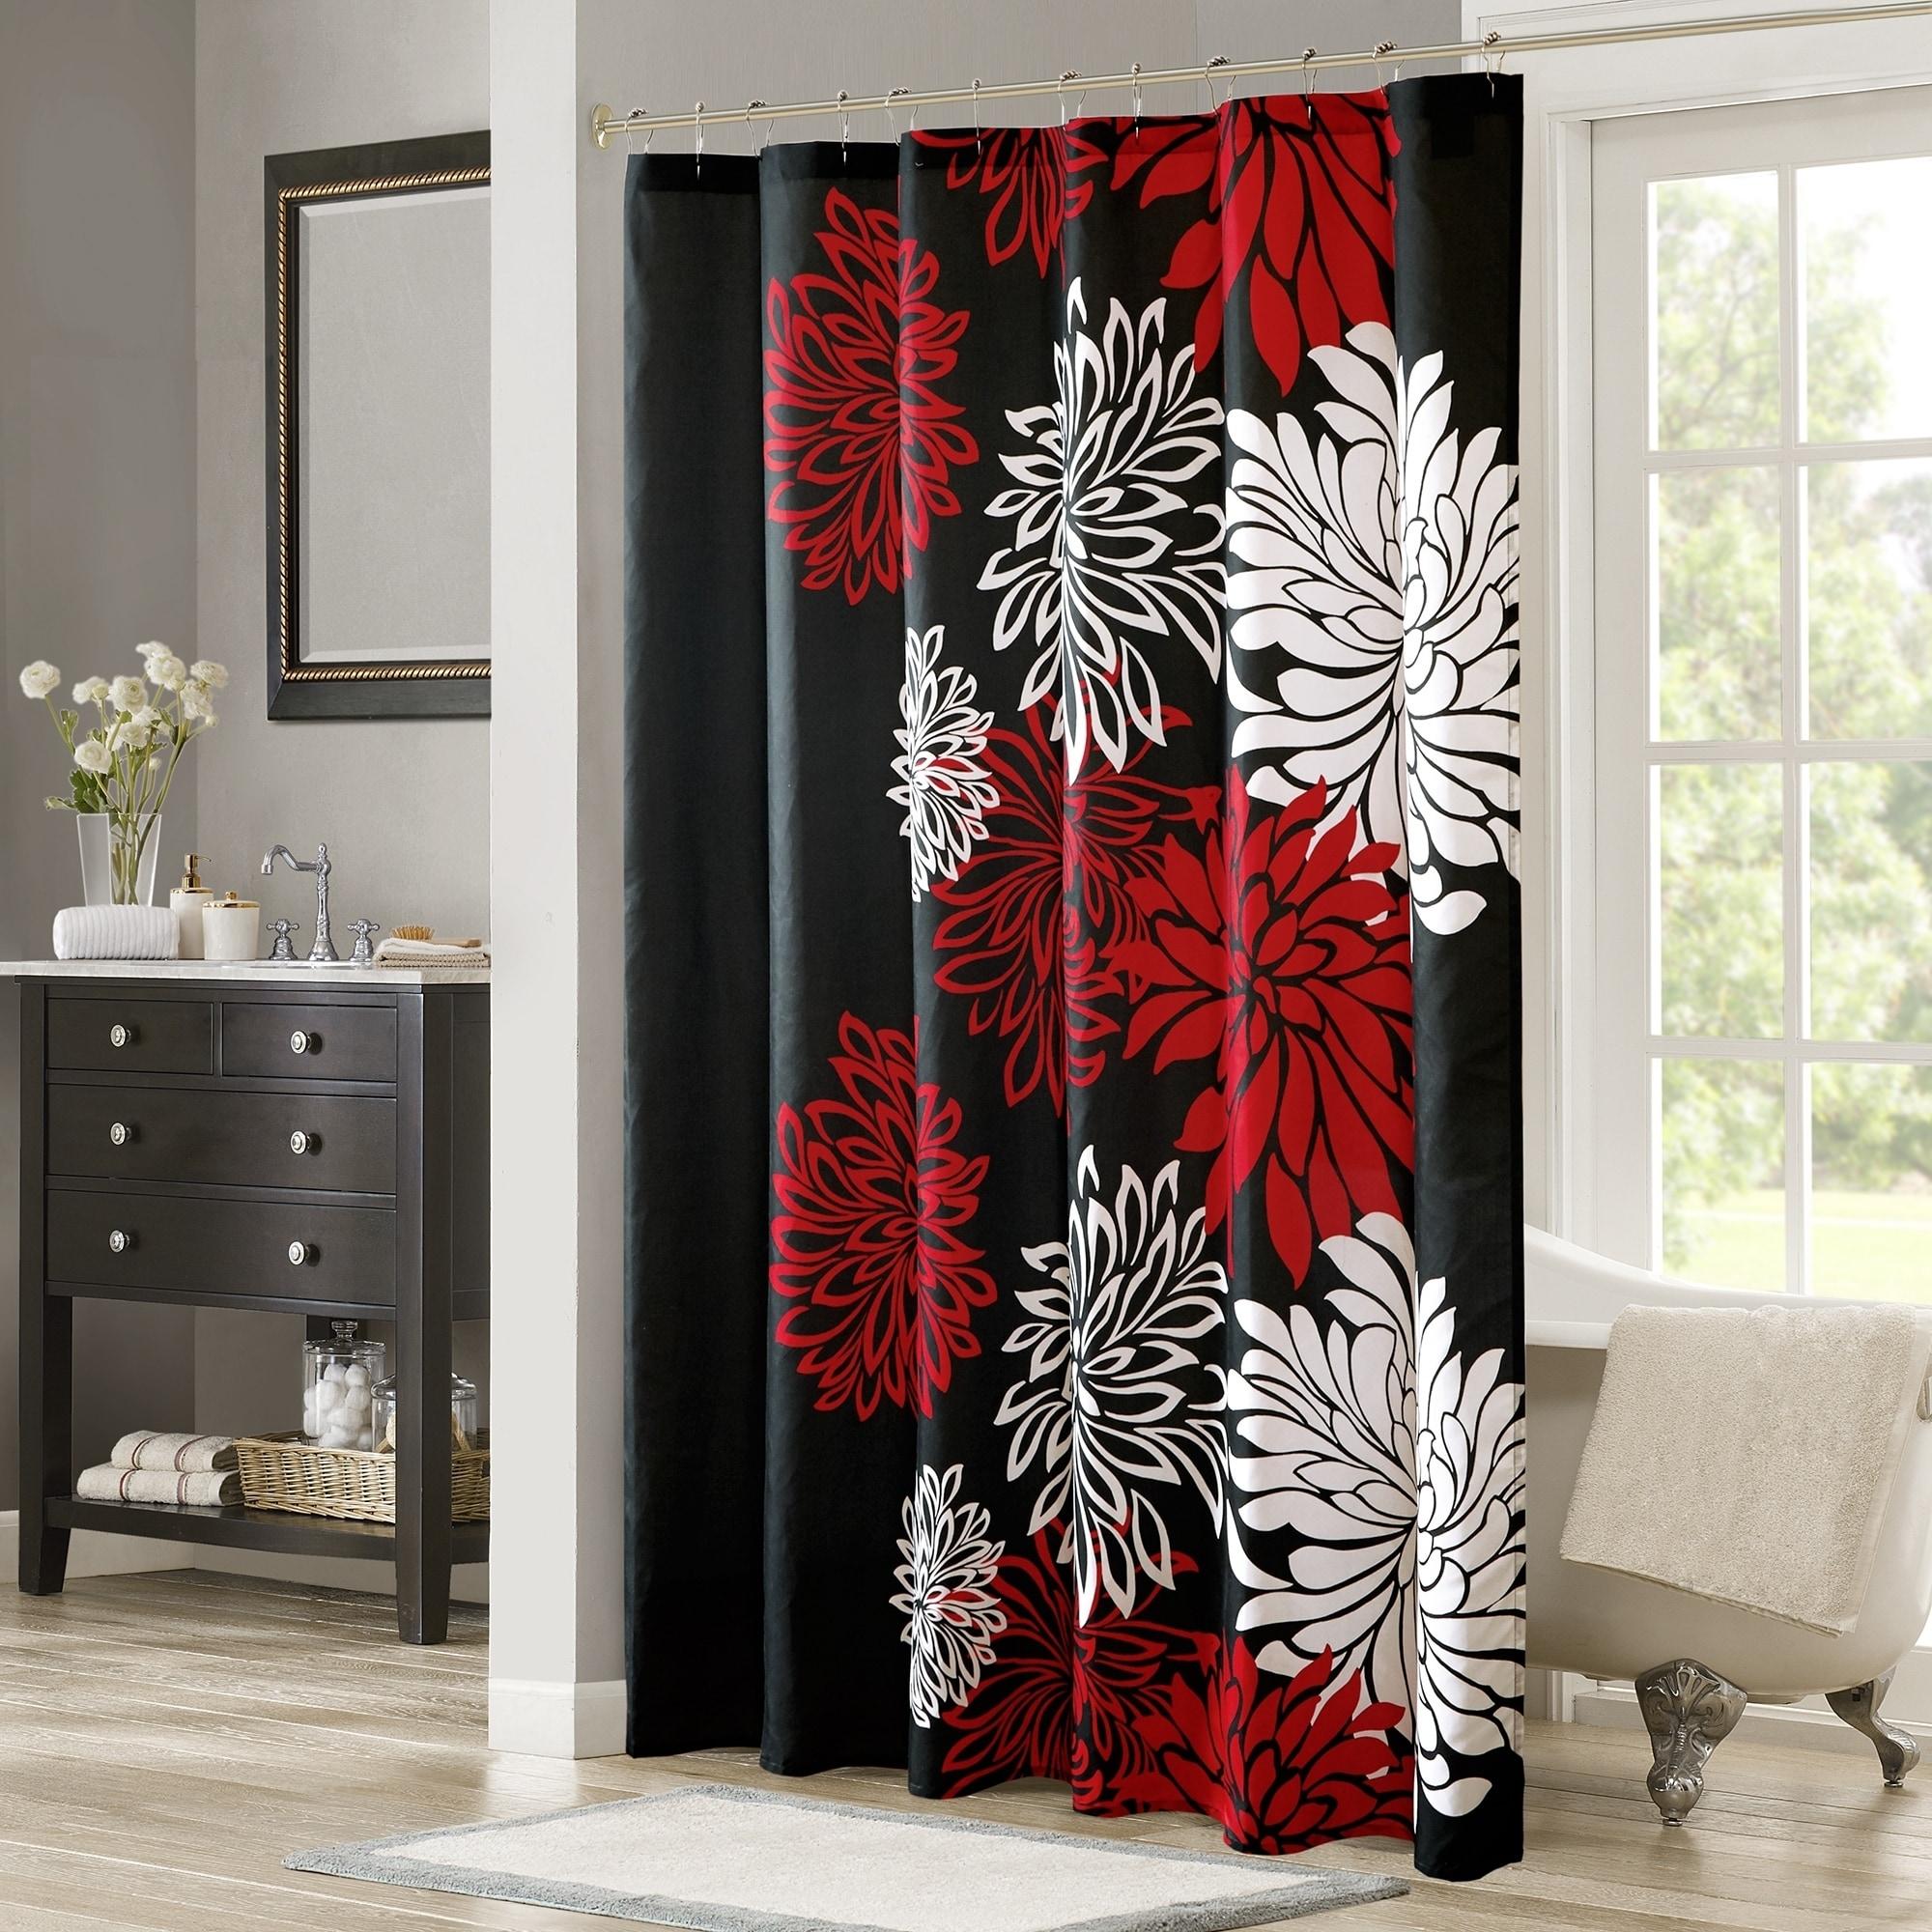 Shop Comfort Spaces Enya Red Black Printed Floral Shower Curtain